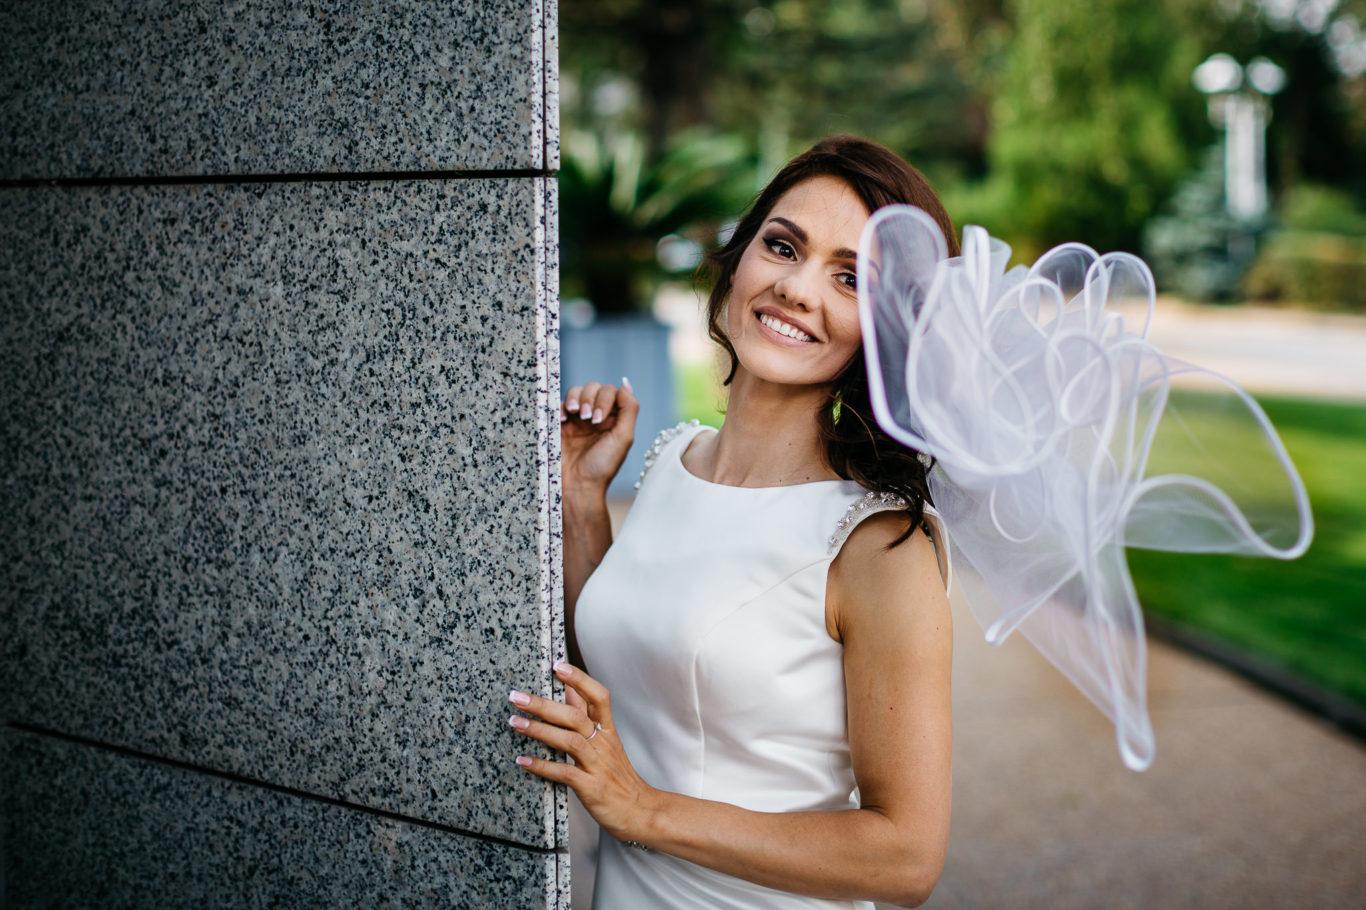 0329-fotografie-nunta-bucuresti-dana-radu-fotograf-ciprian-dumitrescu-cd2_7051